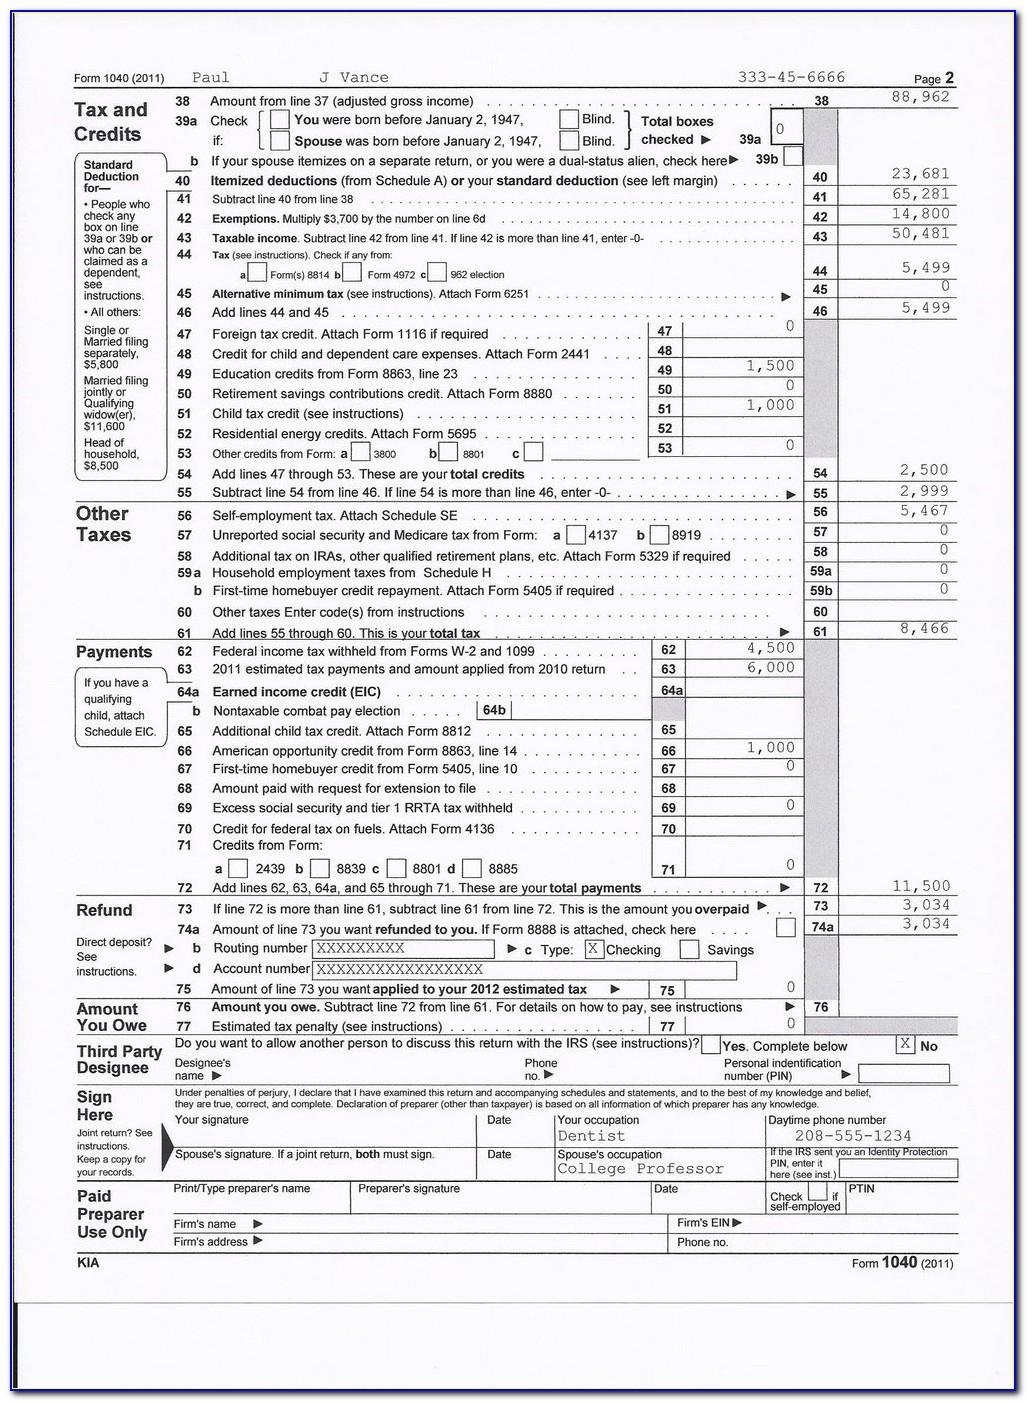 1040ez Federal Tax Form Mailing Address